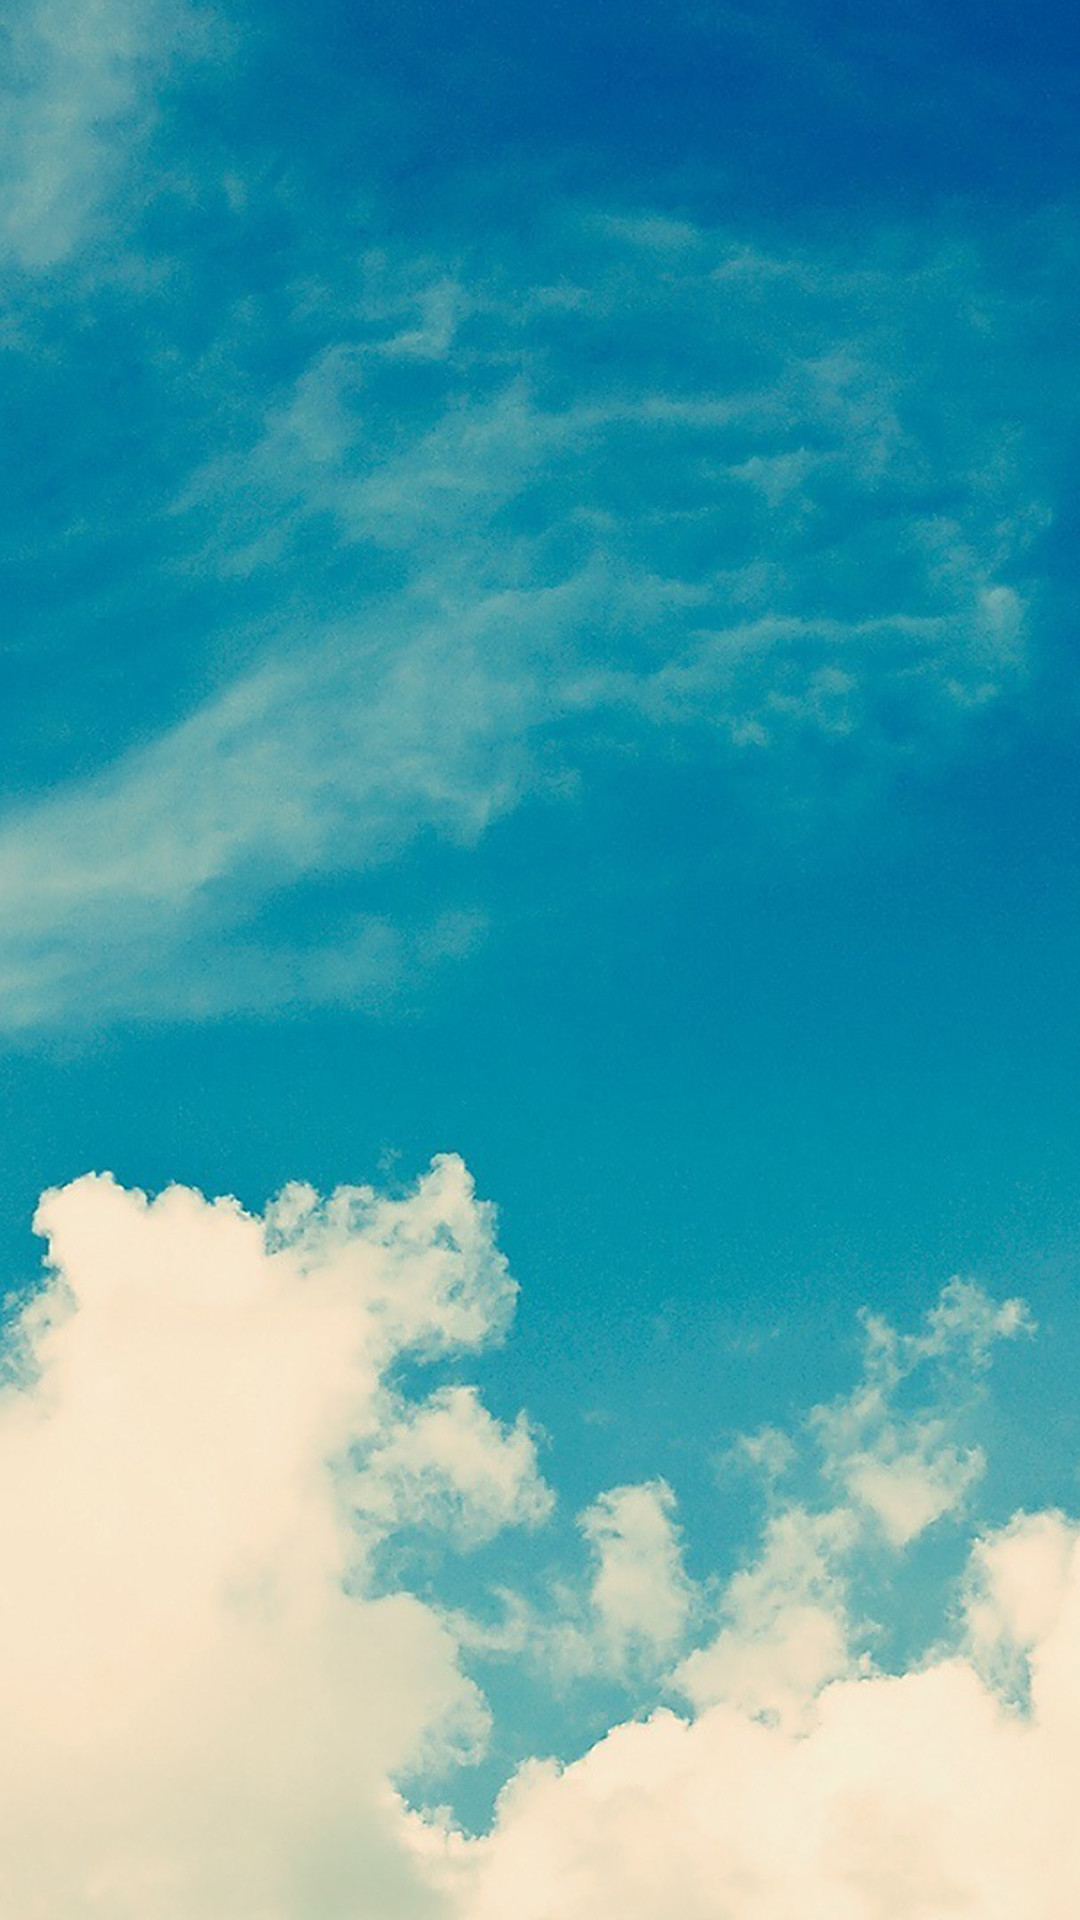 White Vintage Clouds Blu Sky iPhone 6 Plus HD Wallpaper